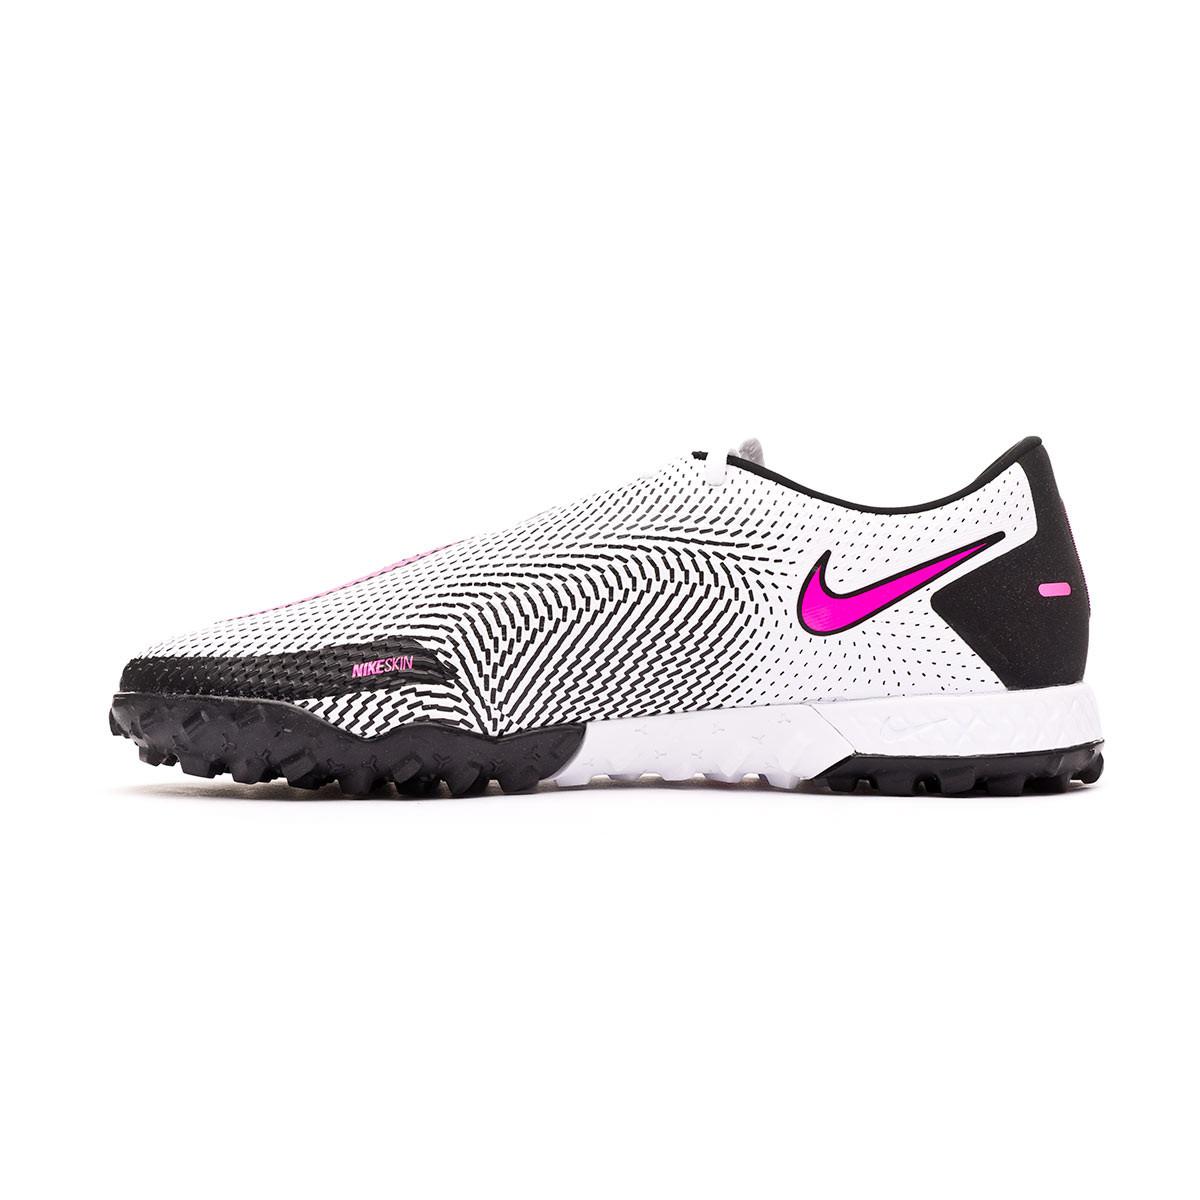 acelerador Picasso complicaciones  Football Boots Nike React Phantom GT Pro Turf White-Pink blast-Black -  Football store Fútbol Emotion